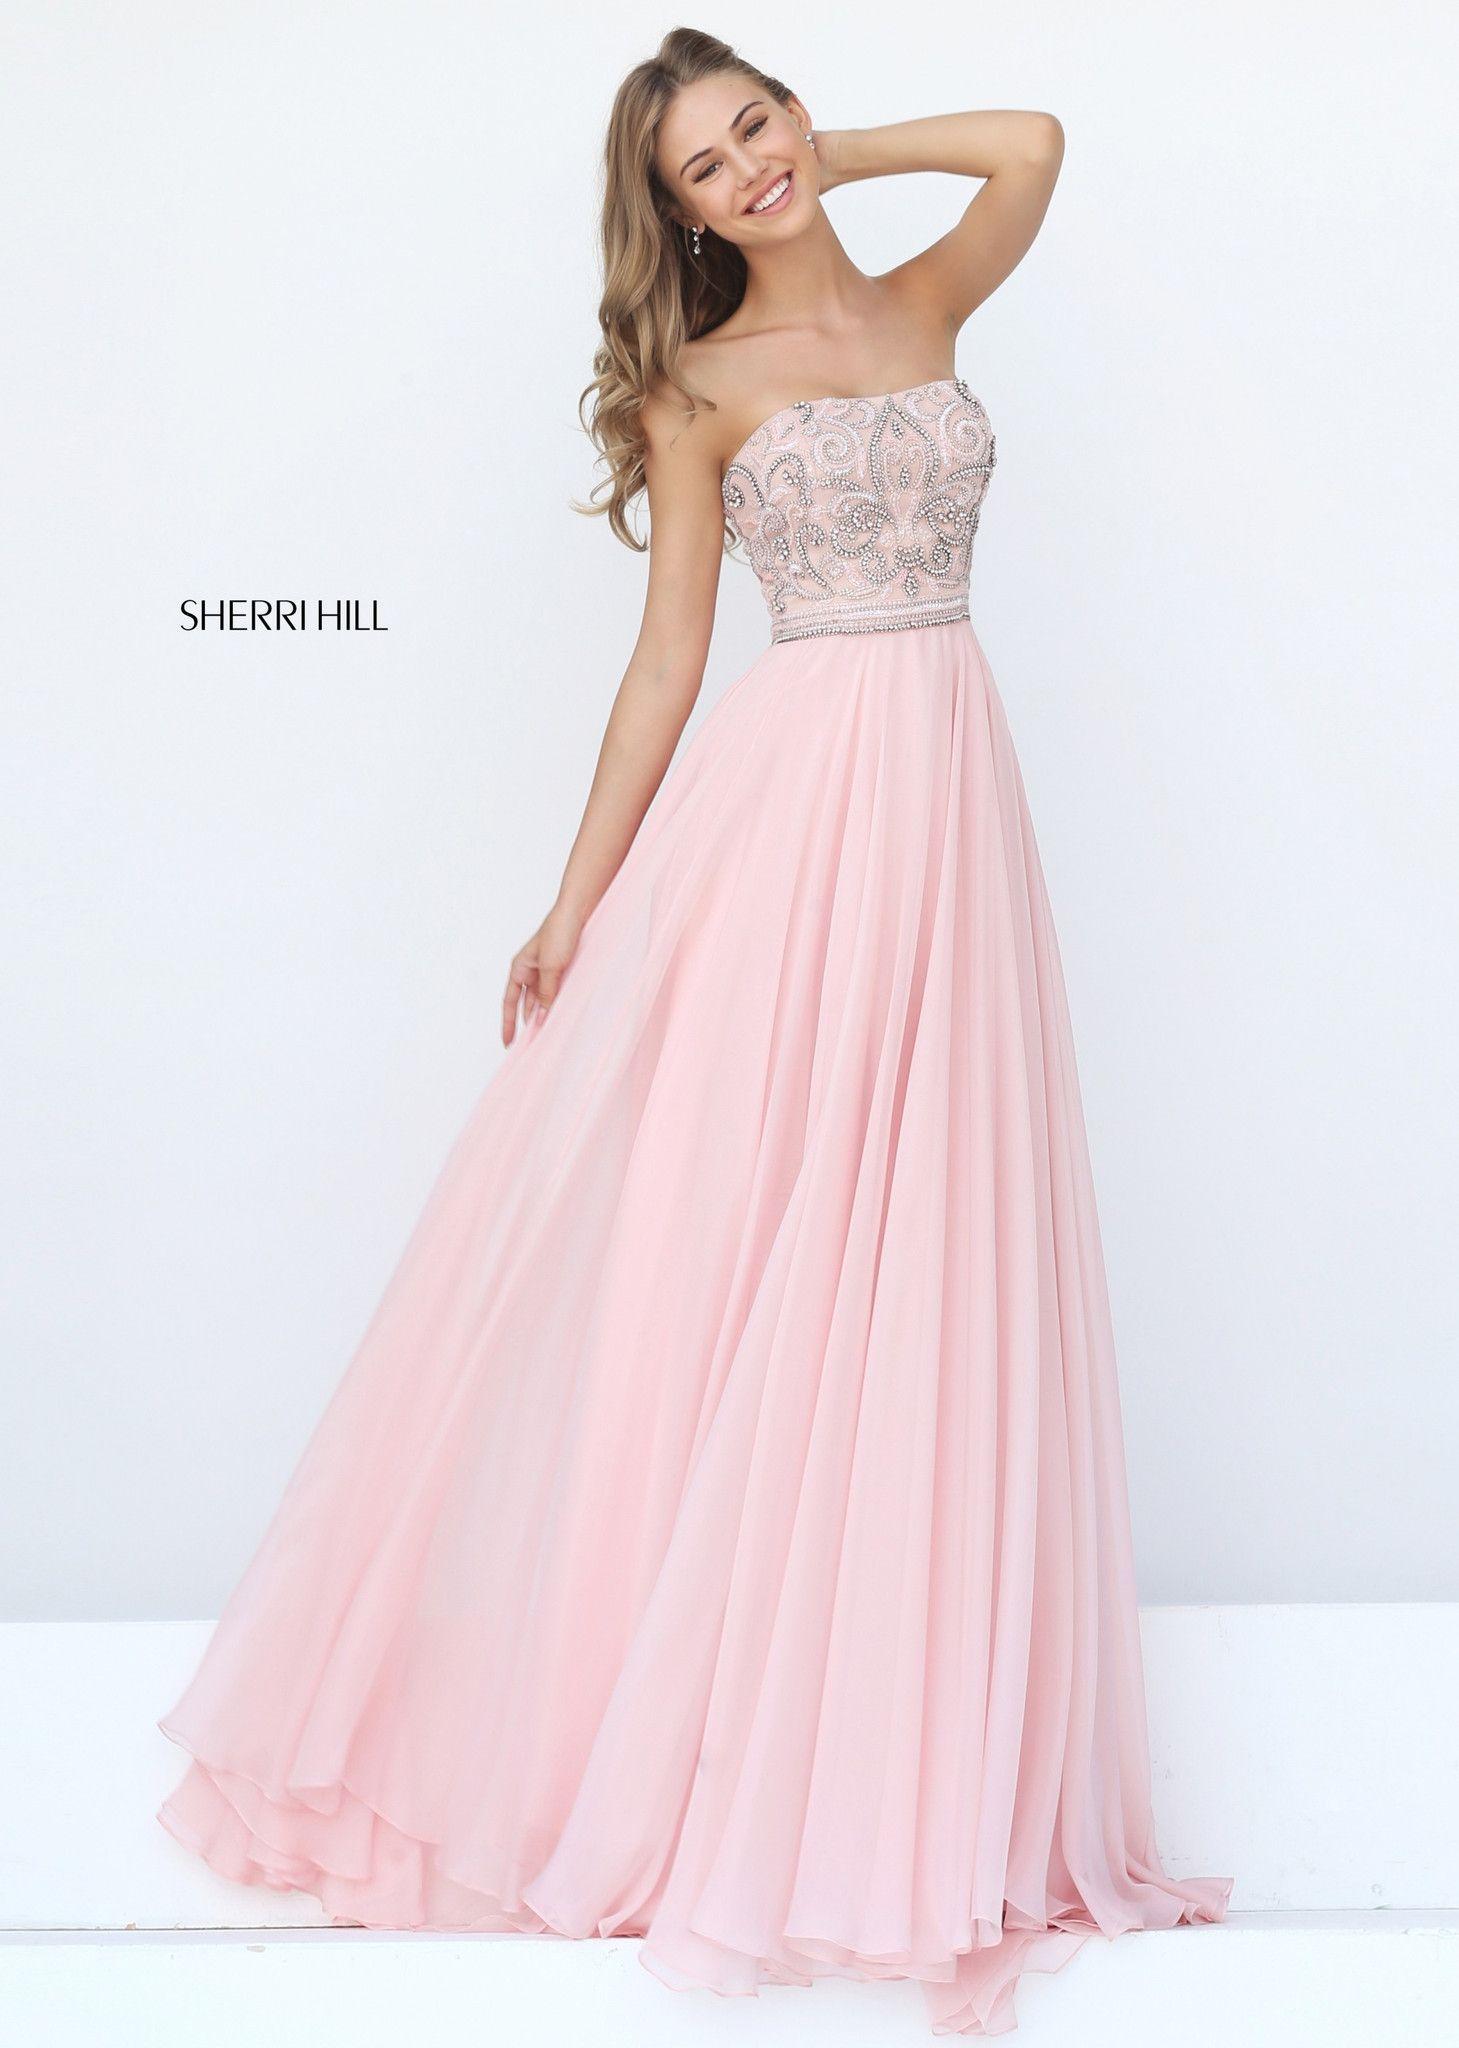 Sherri hill prom dress style moda pinterest sherri hill